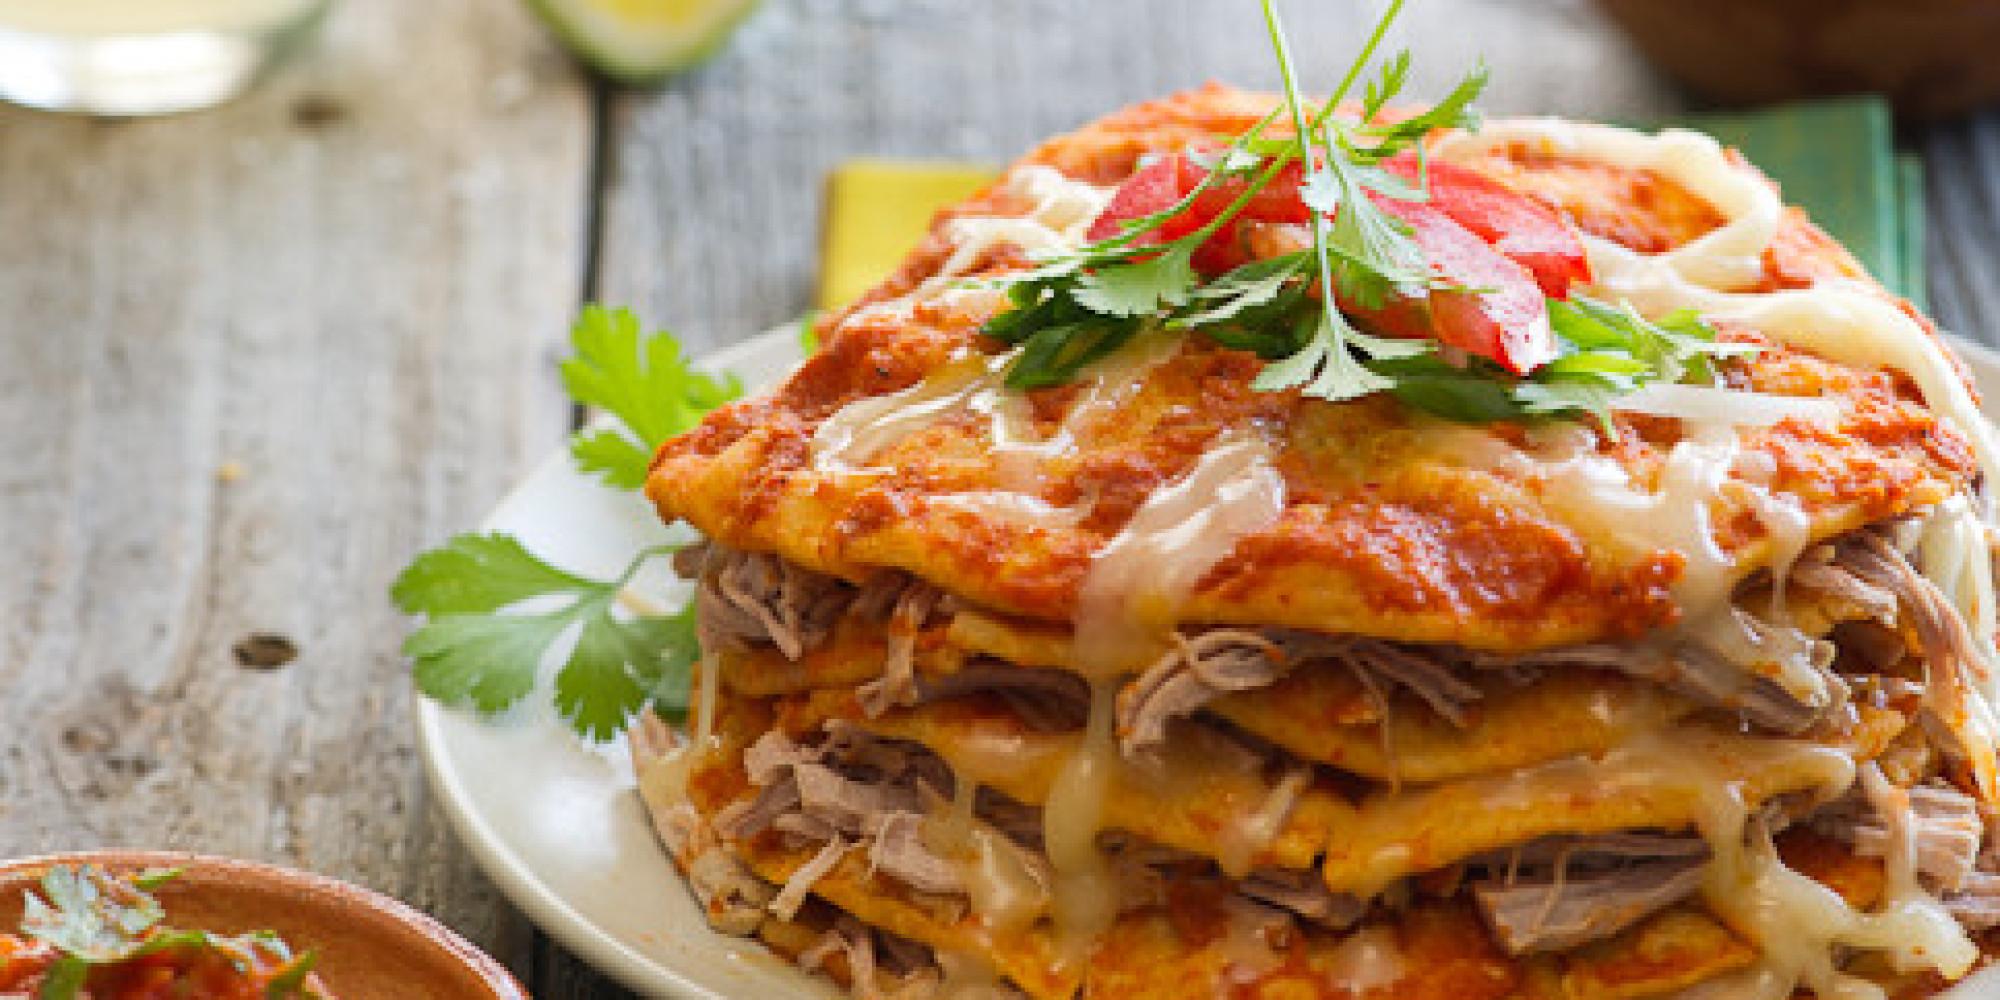 51 Of Our Favorite Mexican Recipes For Tacos Enchiladas